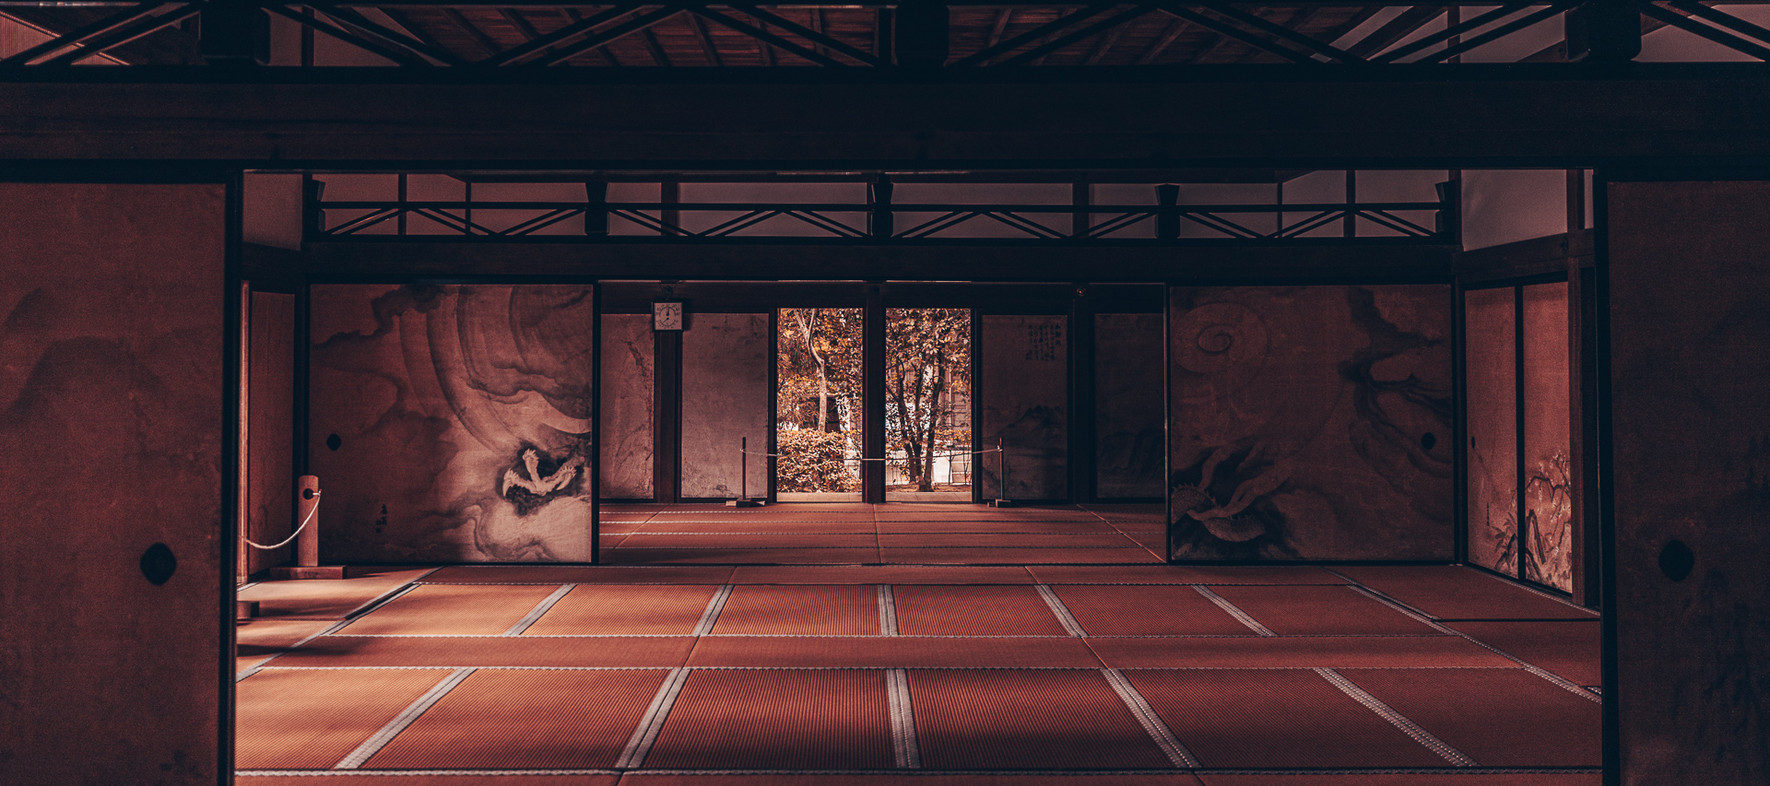 TKPA-Kyoto201911-0495-HDWH.jpg